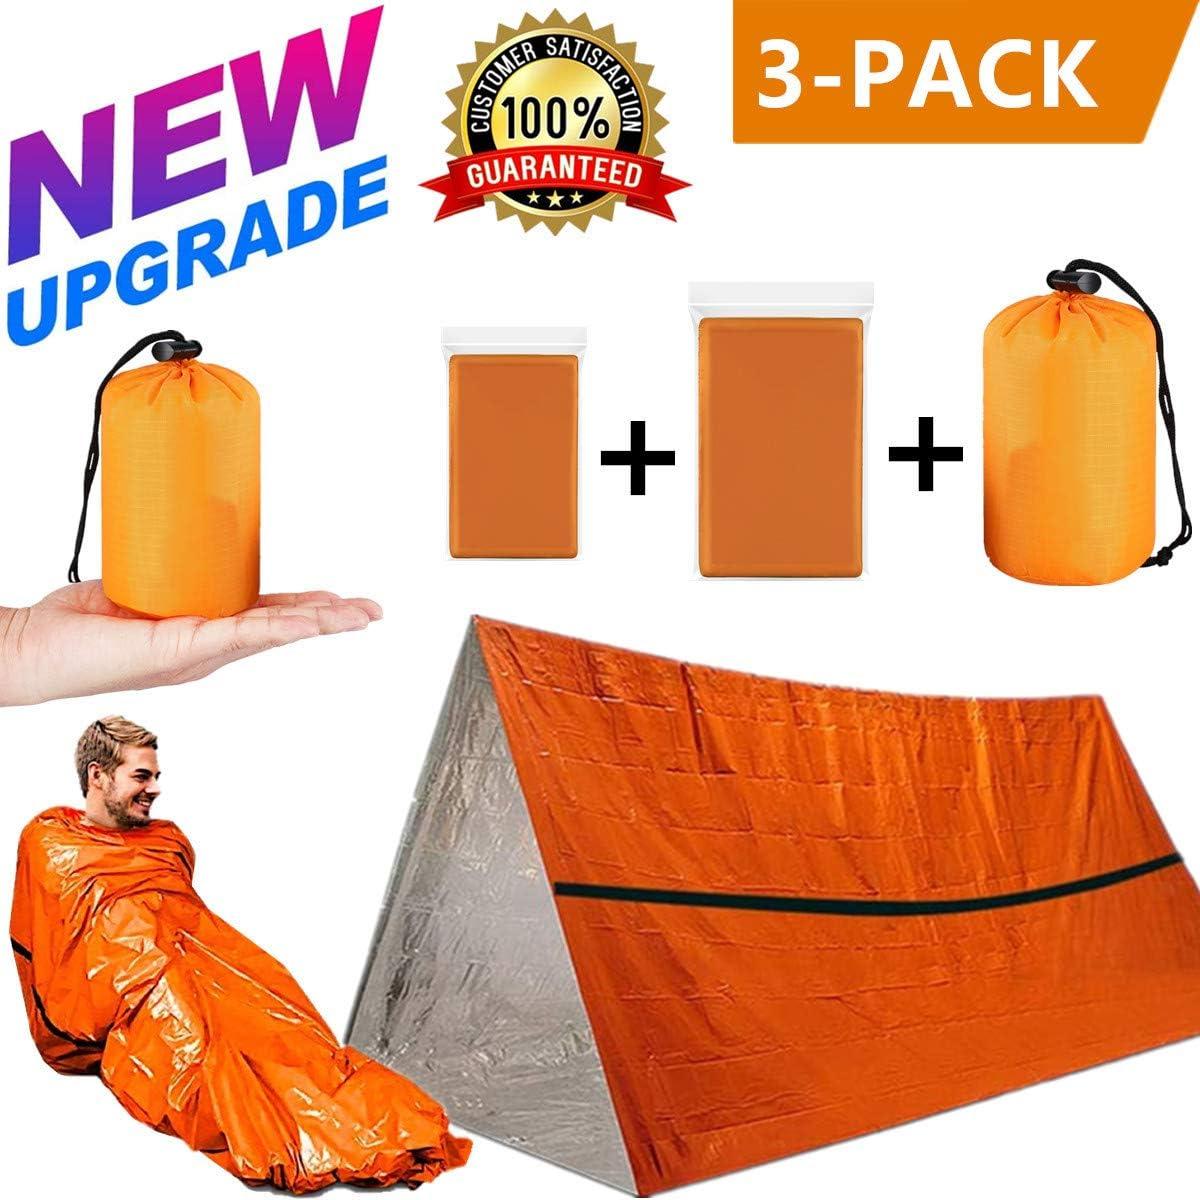 RJCKCC Emergency Tent Emergency Sleeping Bags Camping Emergency Tent Survival Blanket Emergency Sleeping Bag Emergency Tent